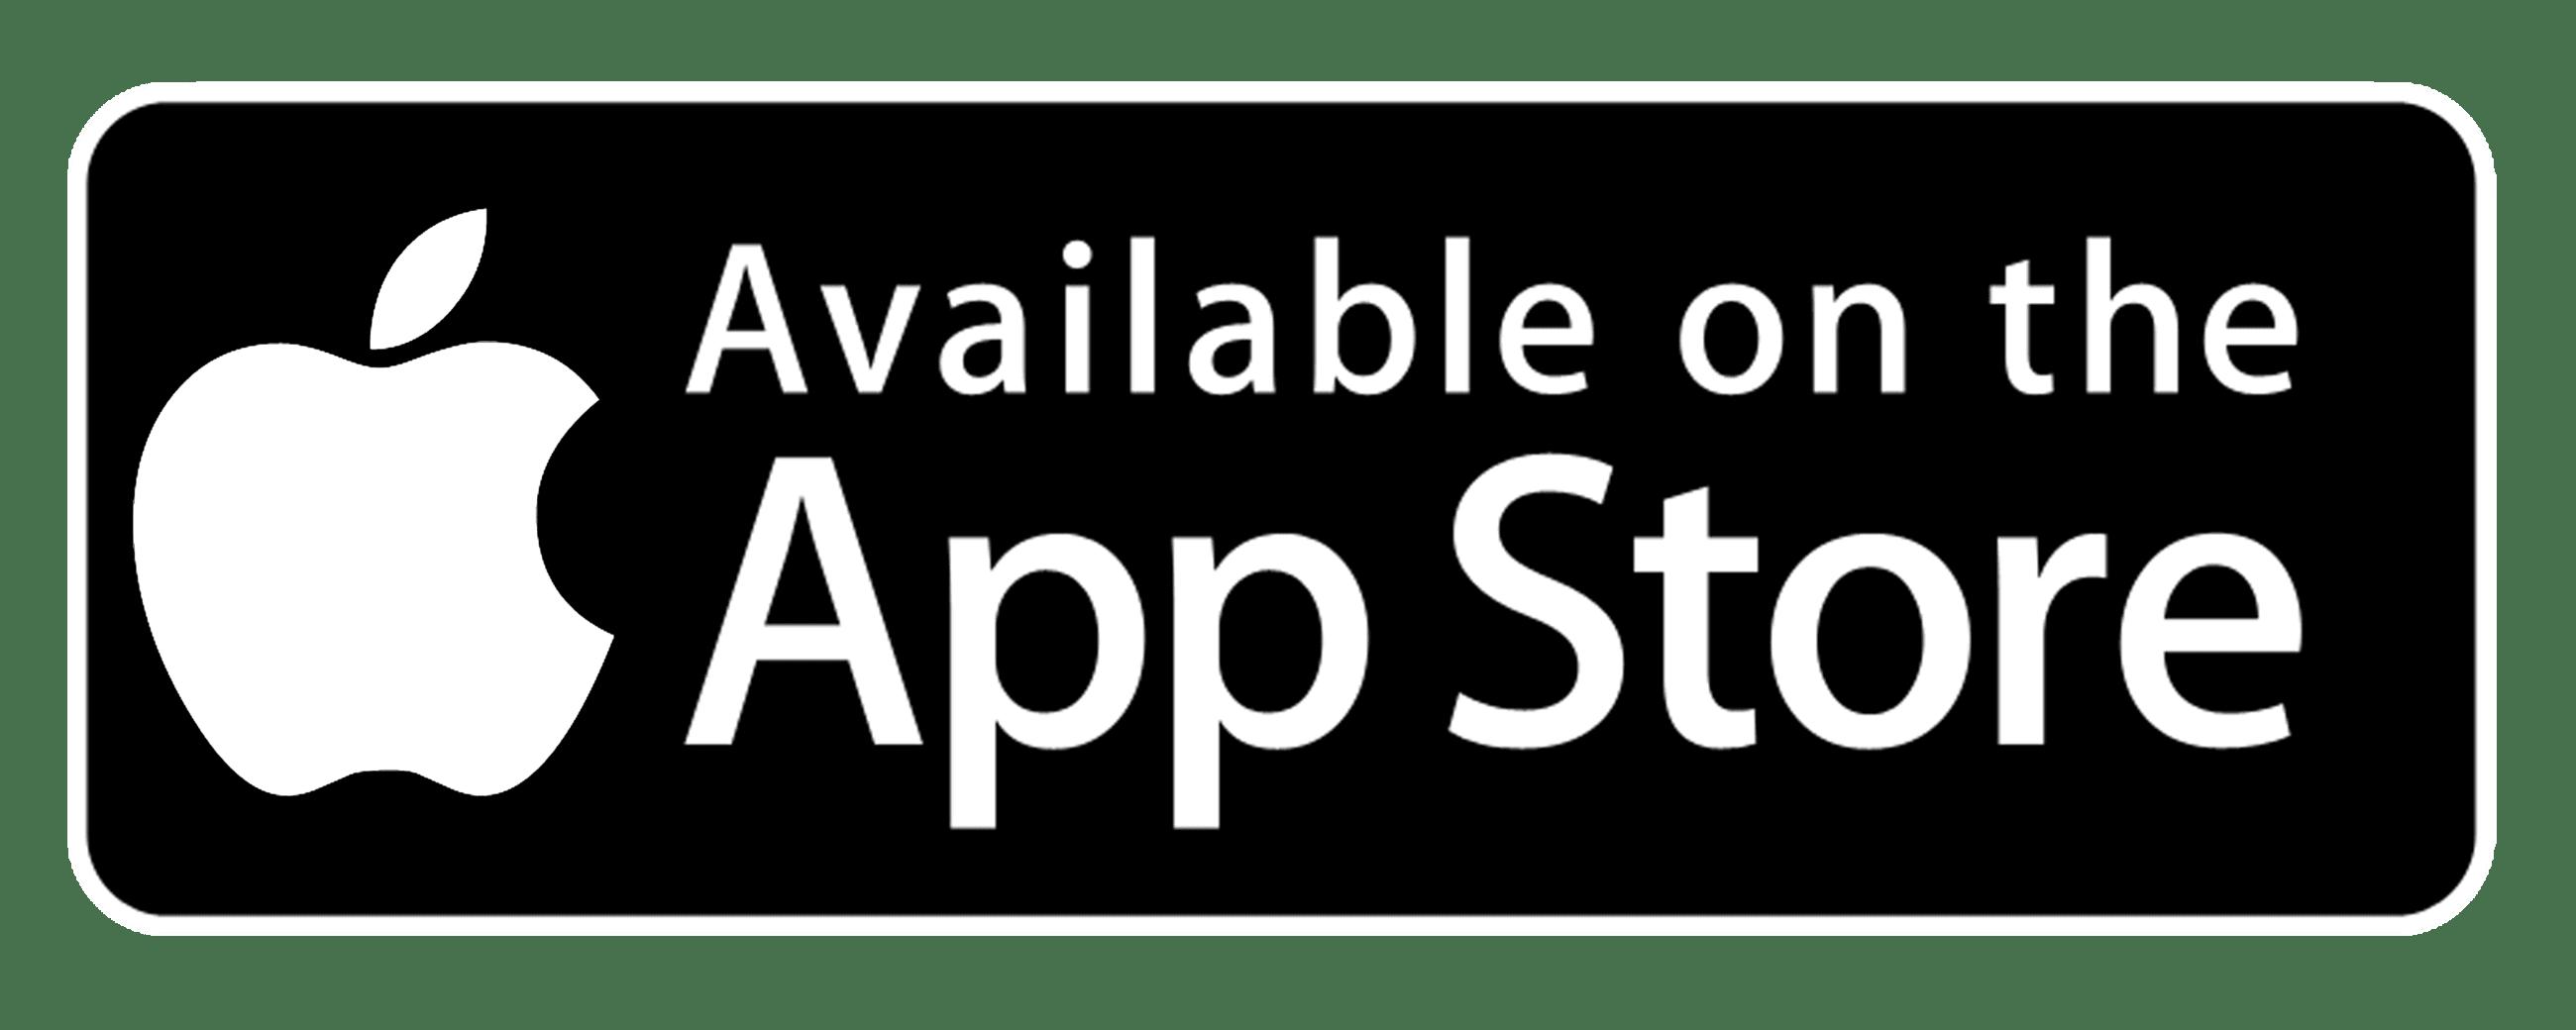 appstore Opens in new window